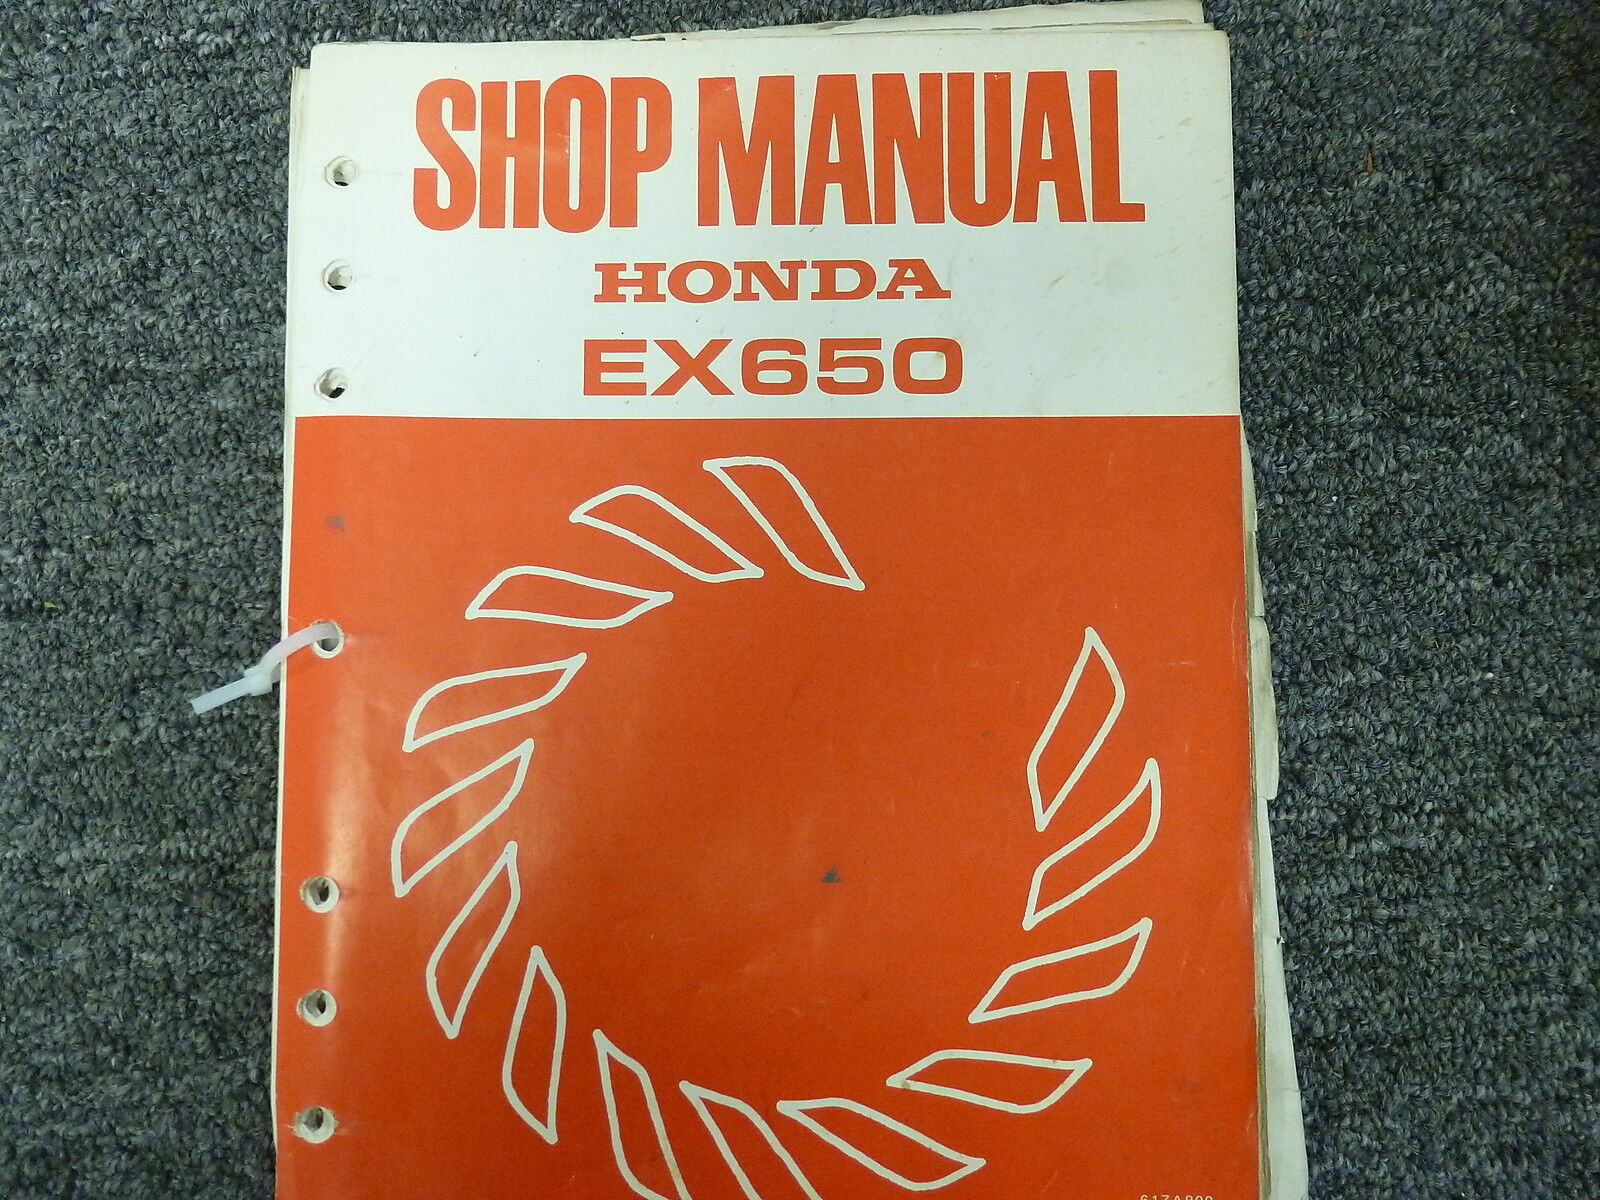 honda ex650 650 generator service repair shop manual ebay rh ebay com honda ex650 service manual honda ex650 service manual